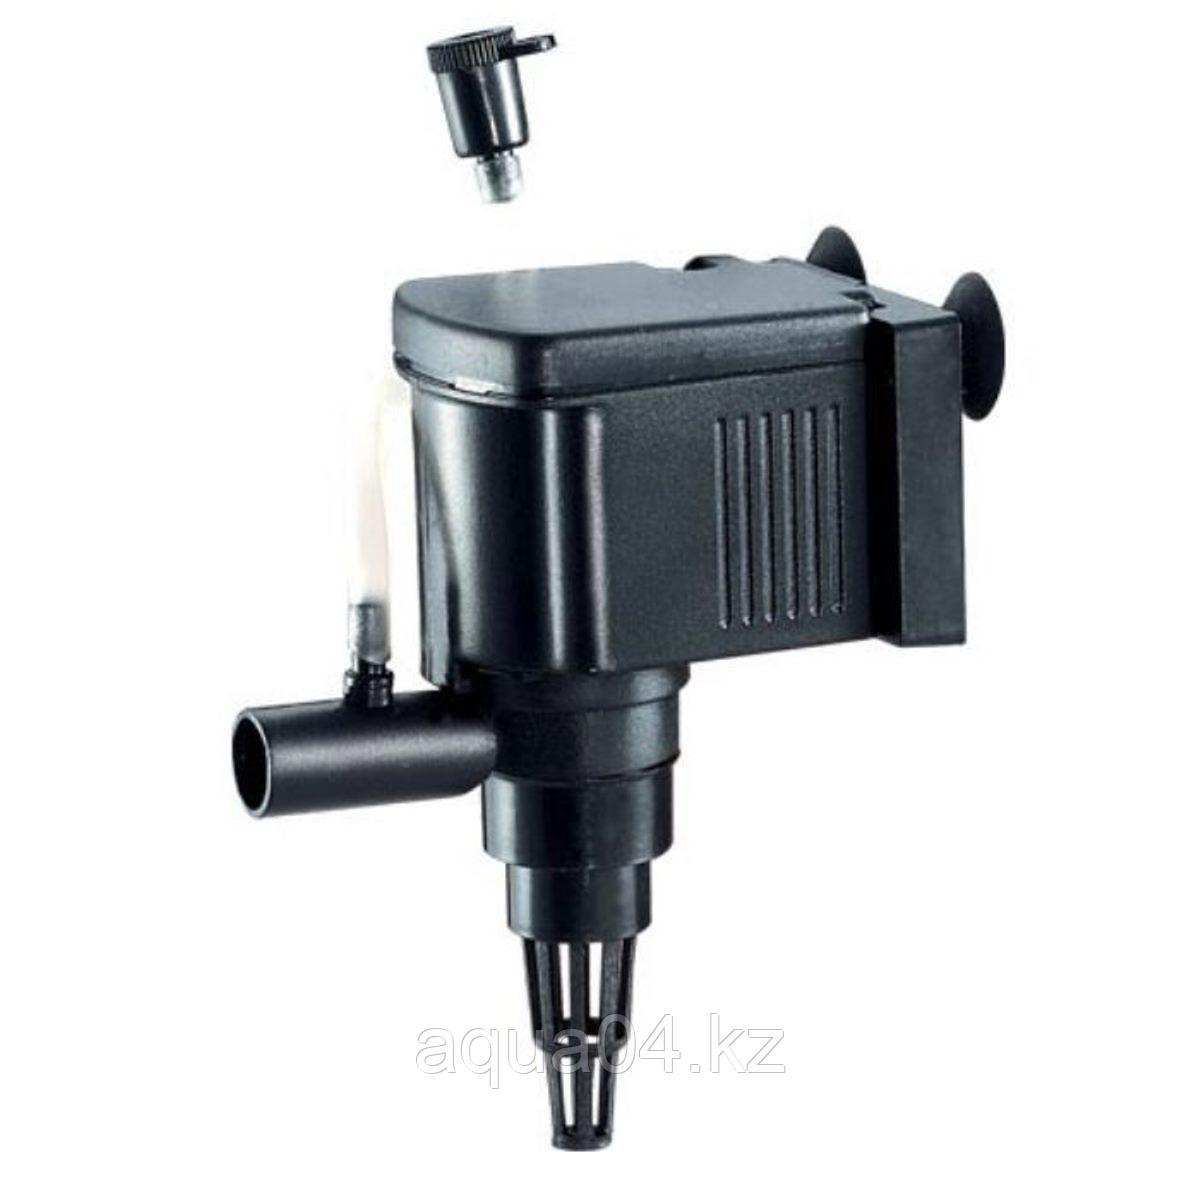 PF-1508 ALEAS Водяная помпа 1500 л/ч, 22w